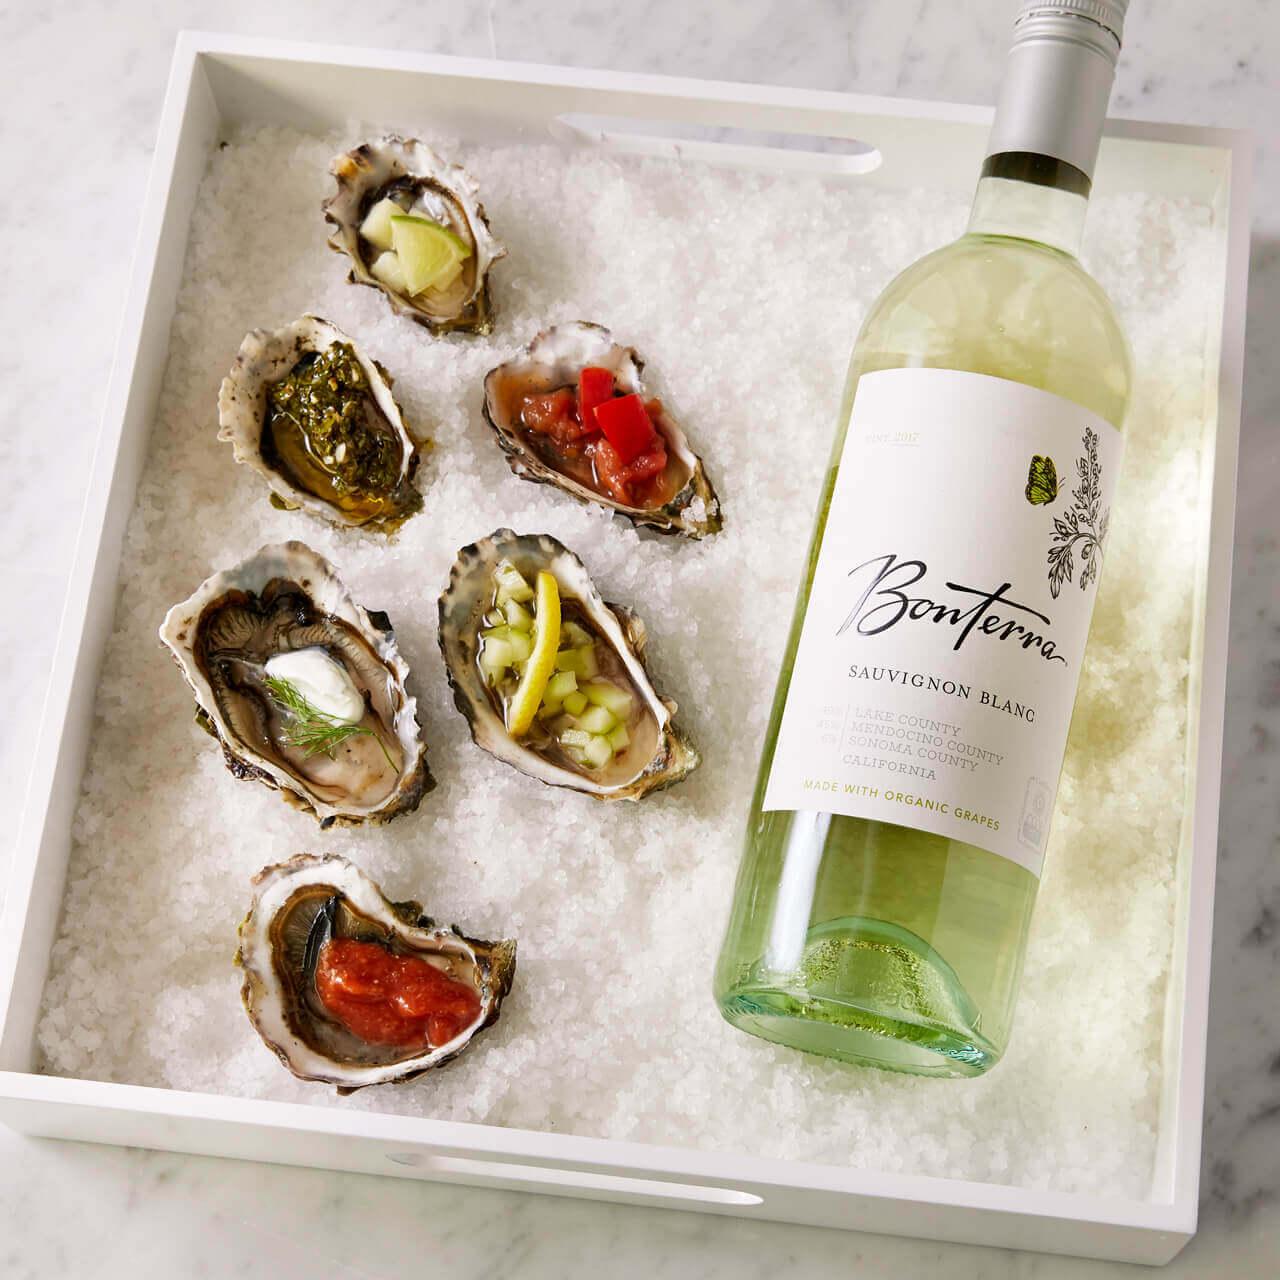 Oysters 6 ways and Bonterra Sauvignon Blanc